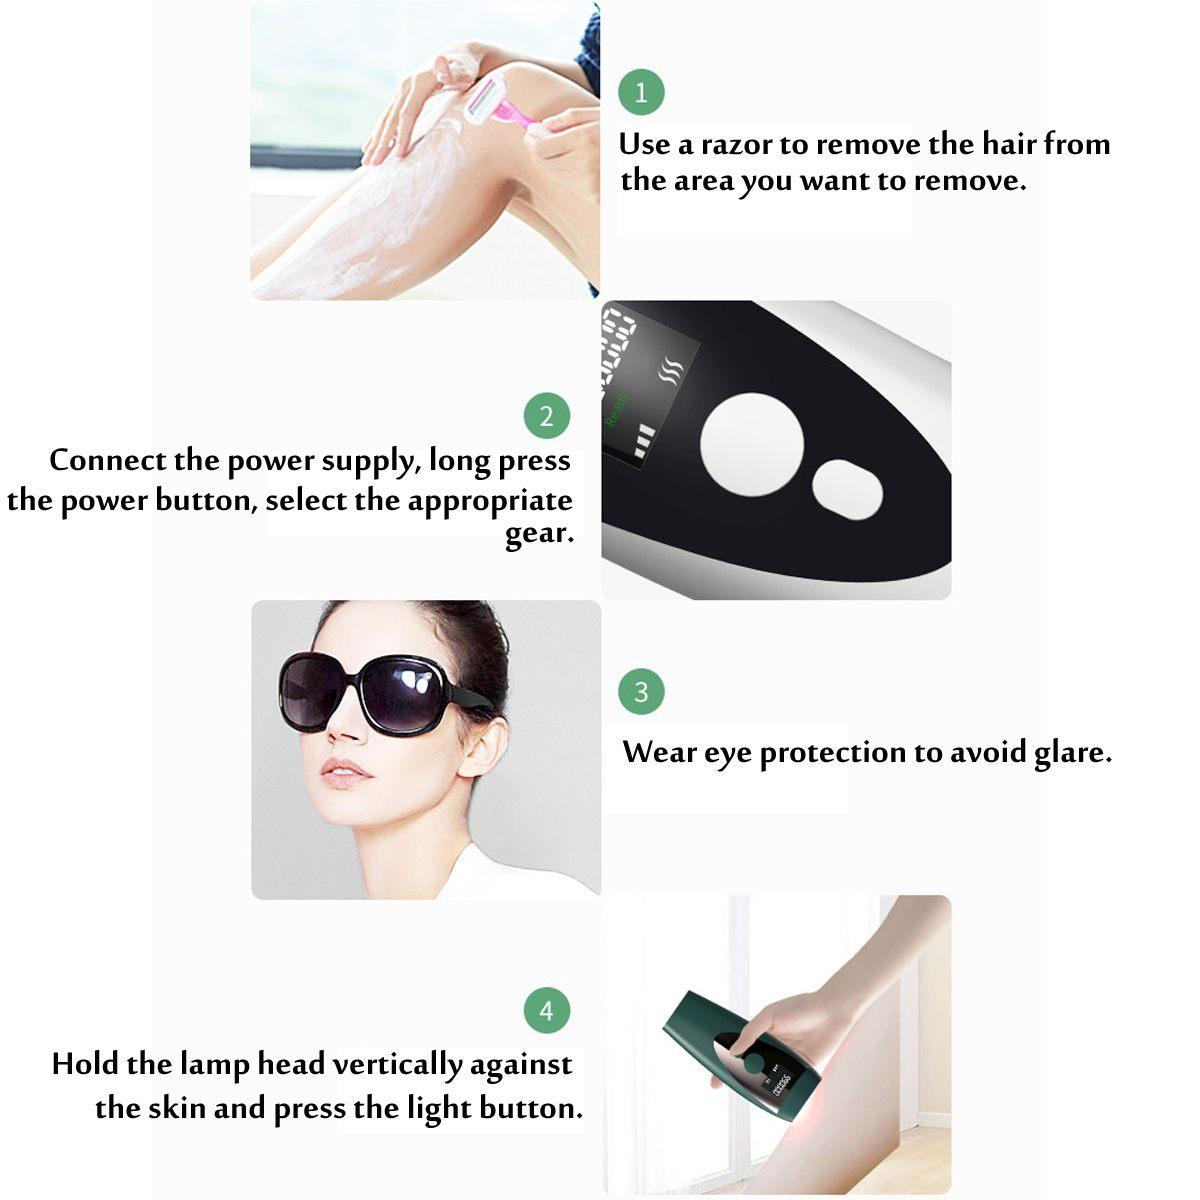 500000 Pulse IPL Laser Epilator Portable 5 Gear Depilator Machine Full Body Hair Removal Device Painless Personal Care Appliance enlarge